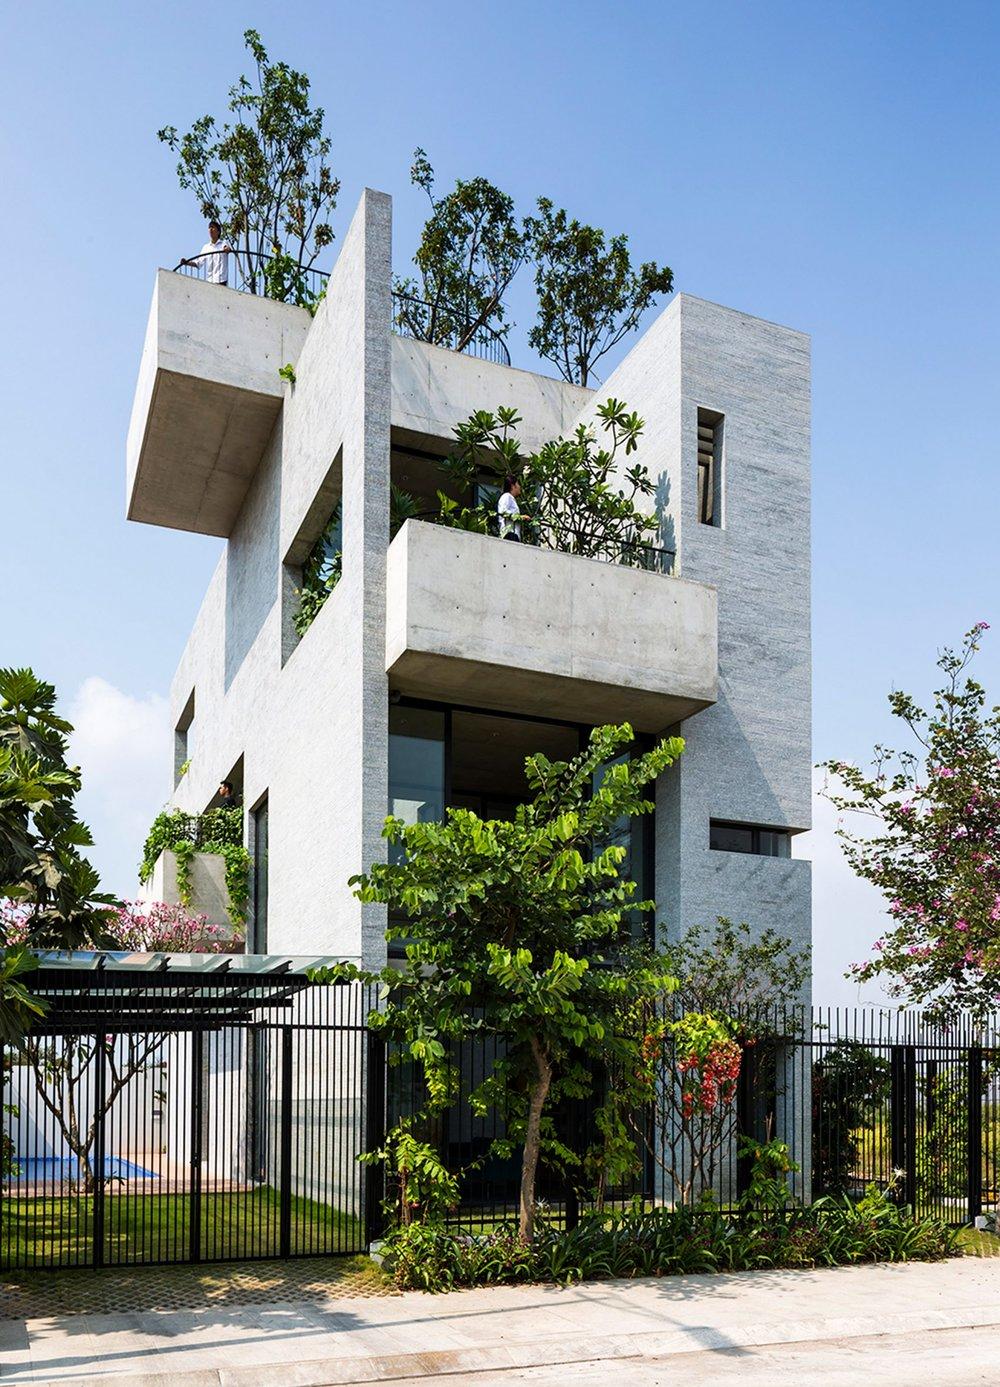 binh-house-vo-trong-nghia-architects-residential-vietnam_dezeen_2364_col_1-e1492108475754-1704x2364.jpg